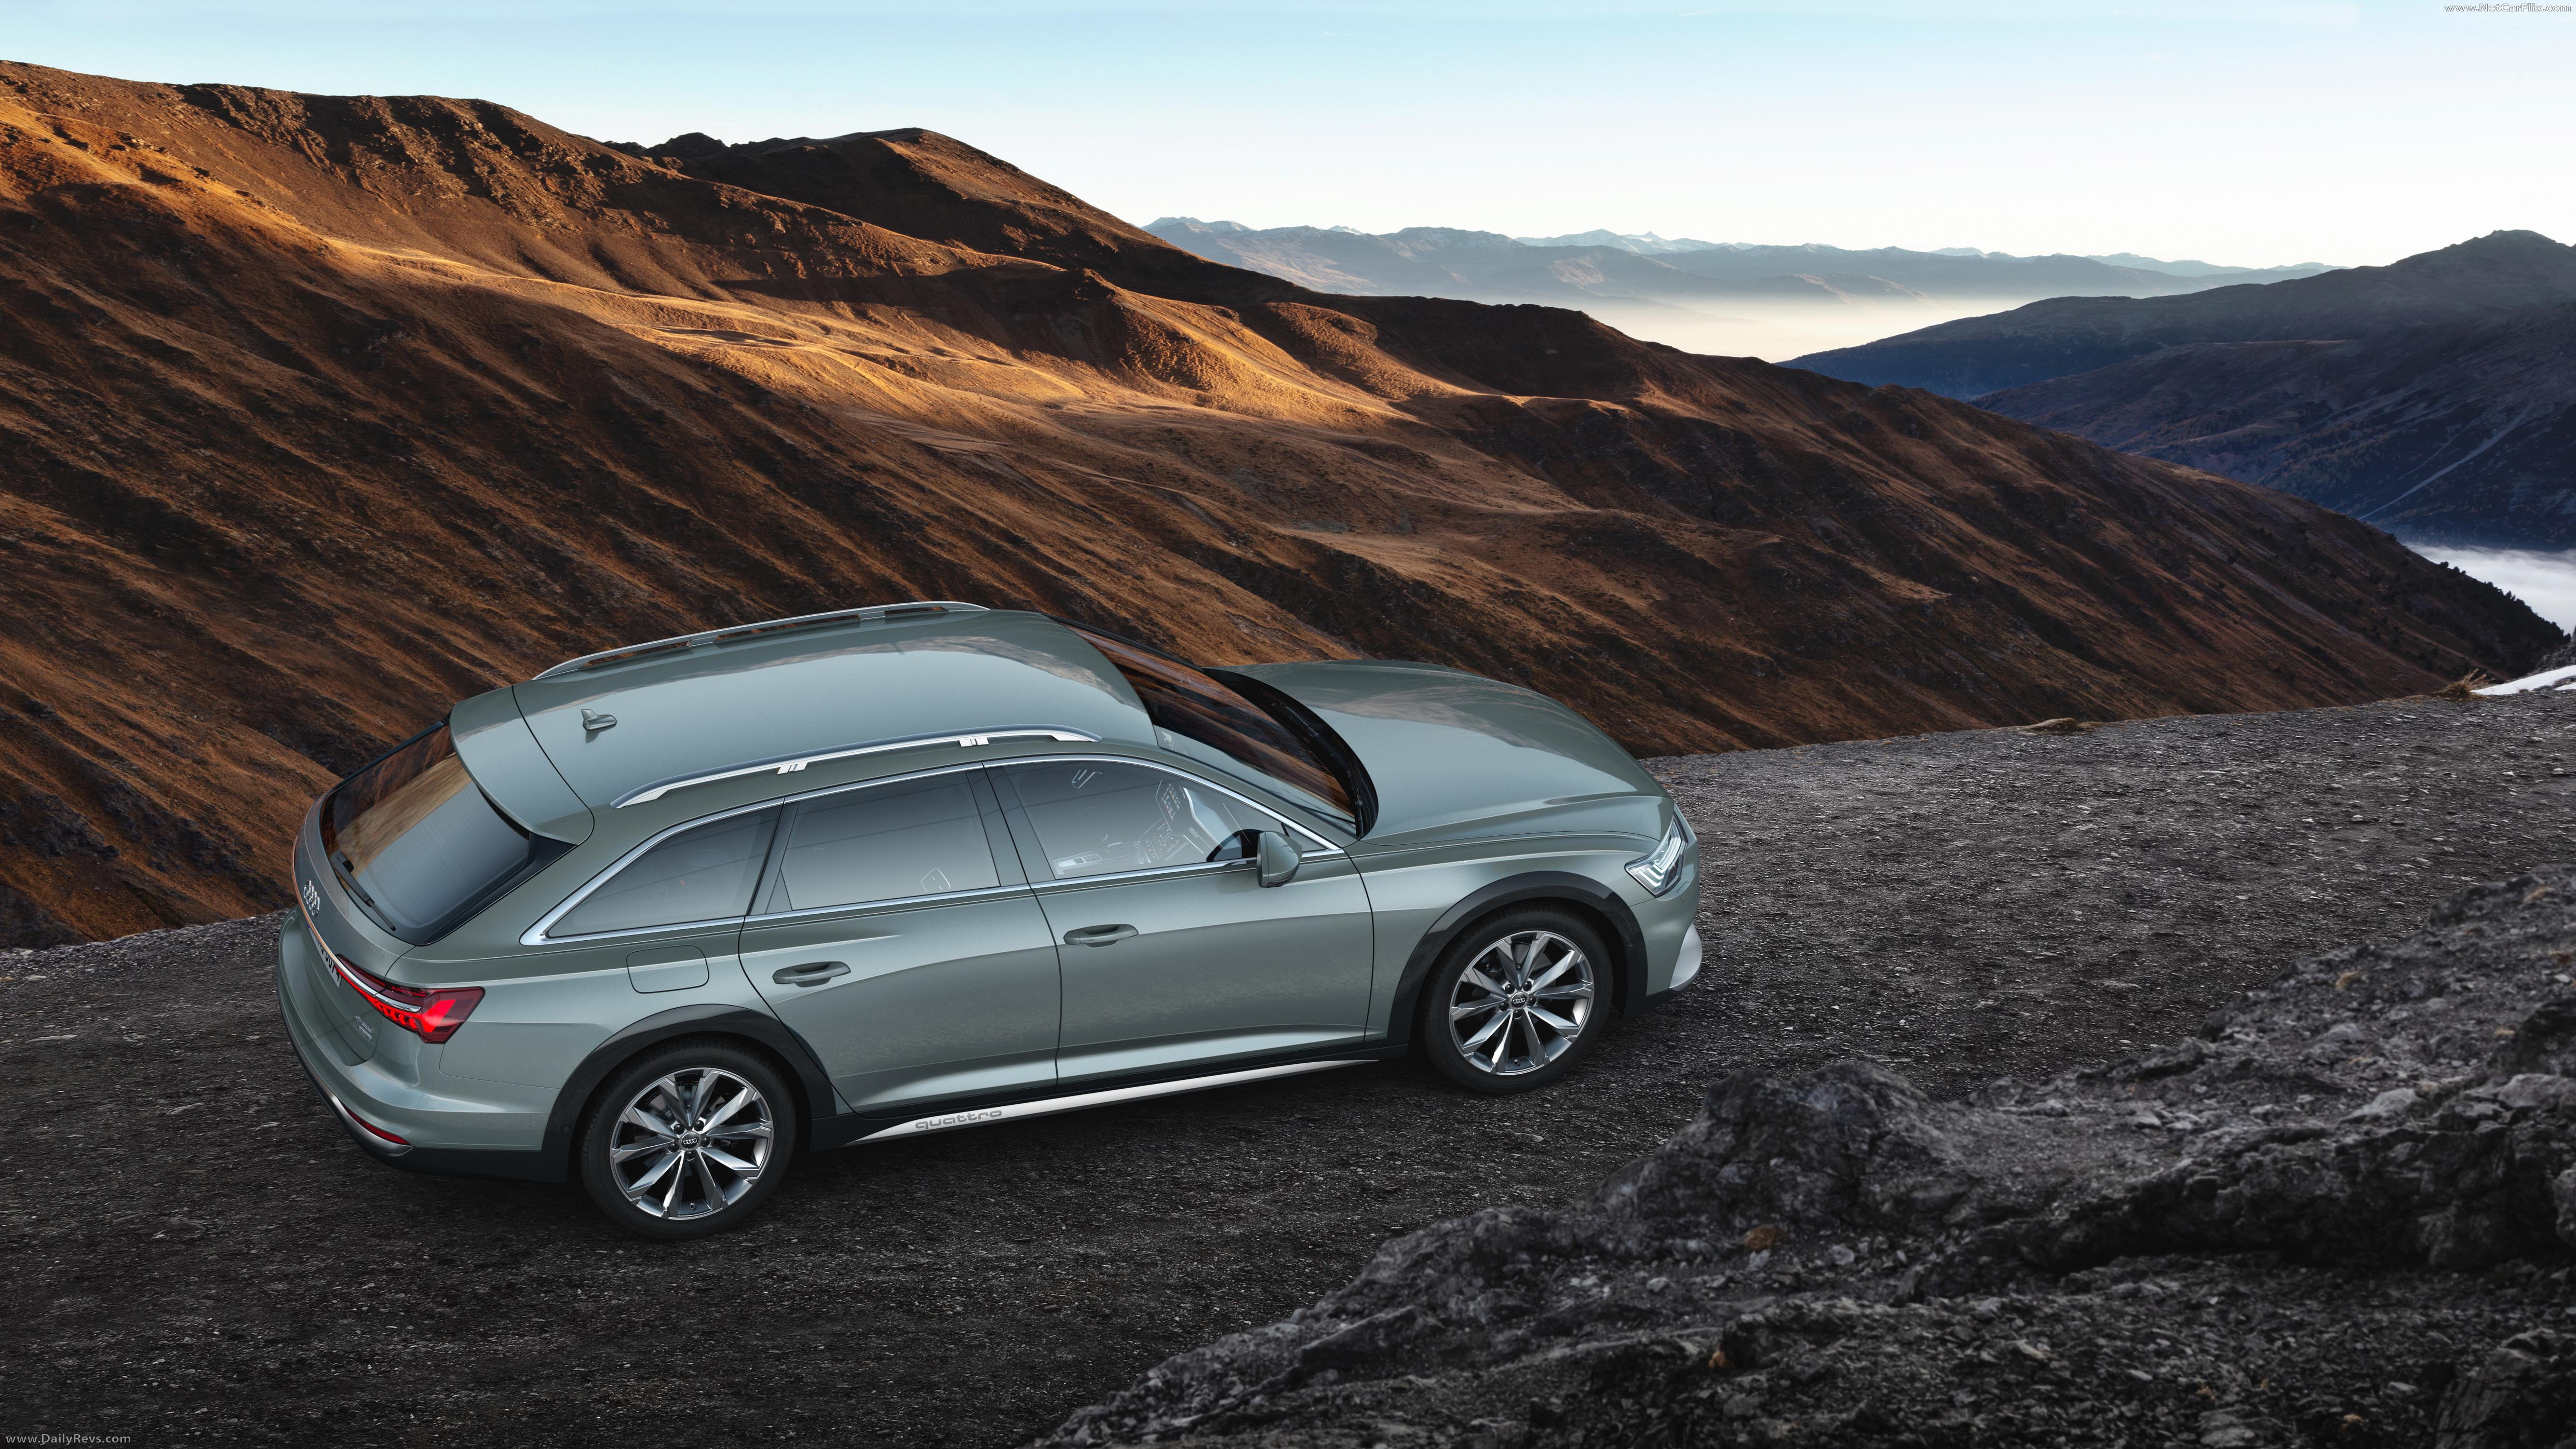 2020 Audi A6 allroad quattro - Pictures, Images, Photos ...